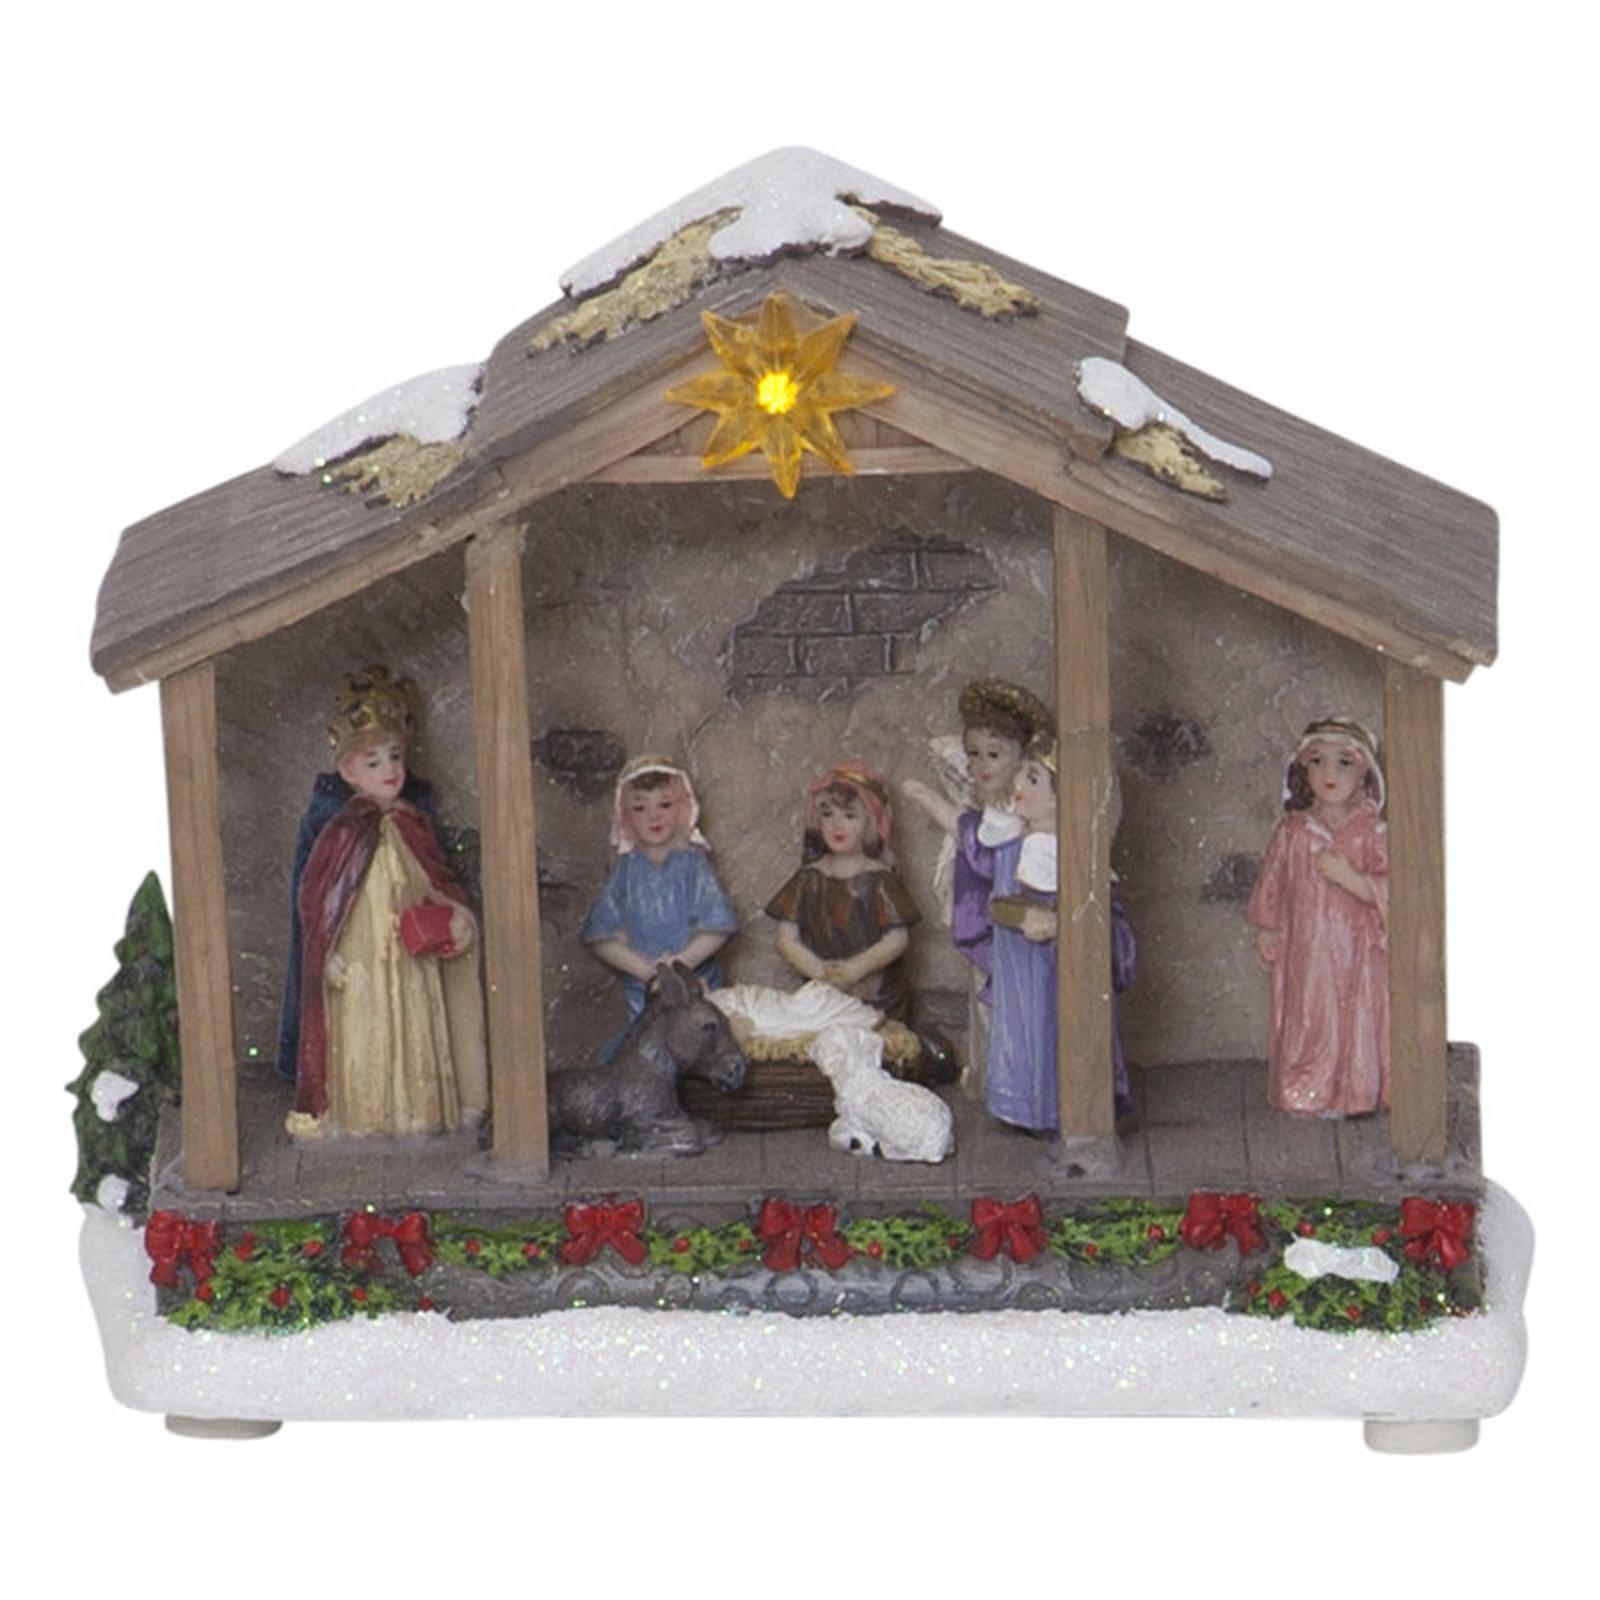 LED-dekorbelysning Nativity, batteridrift, 19 cm